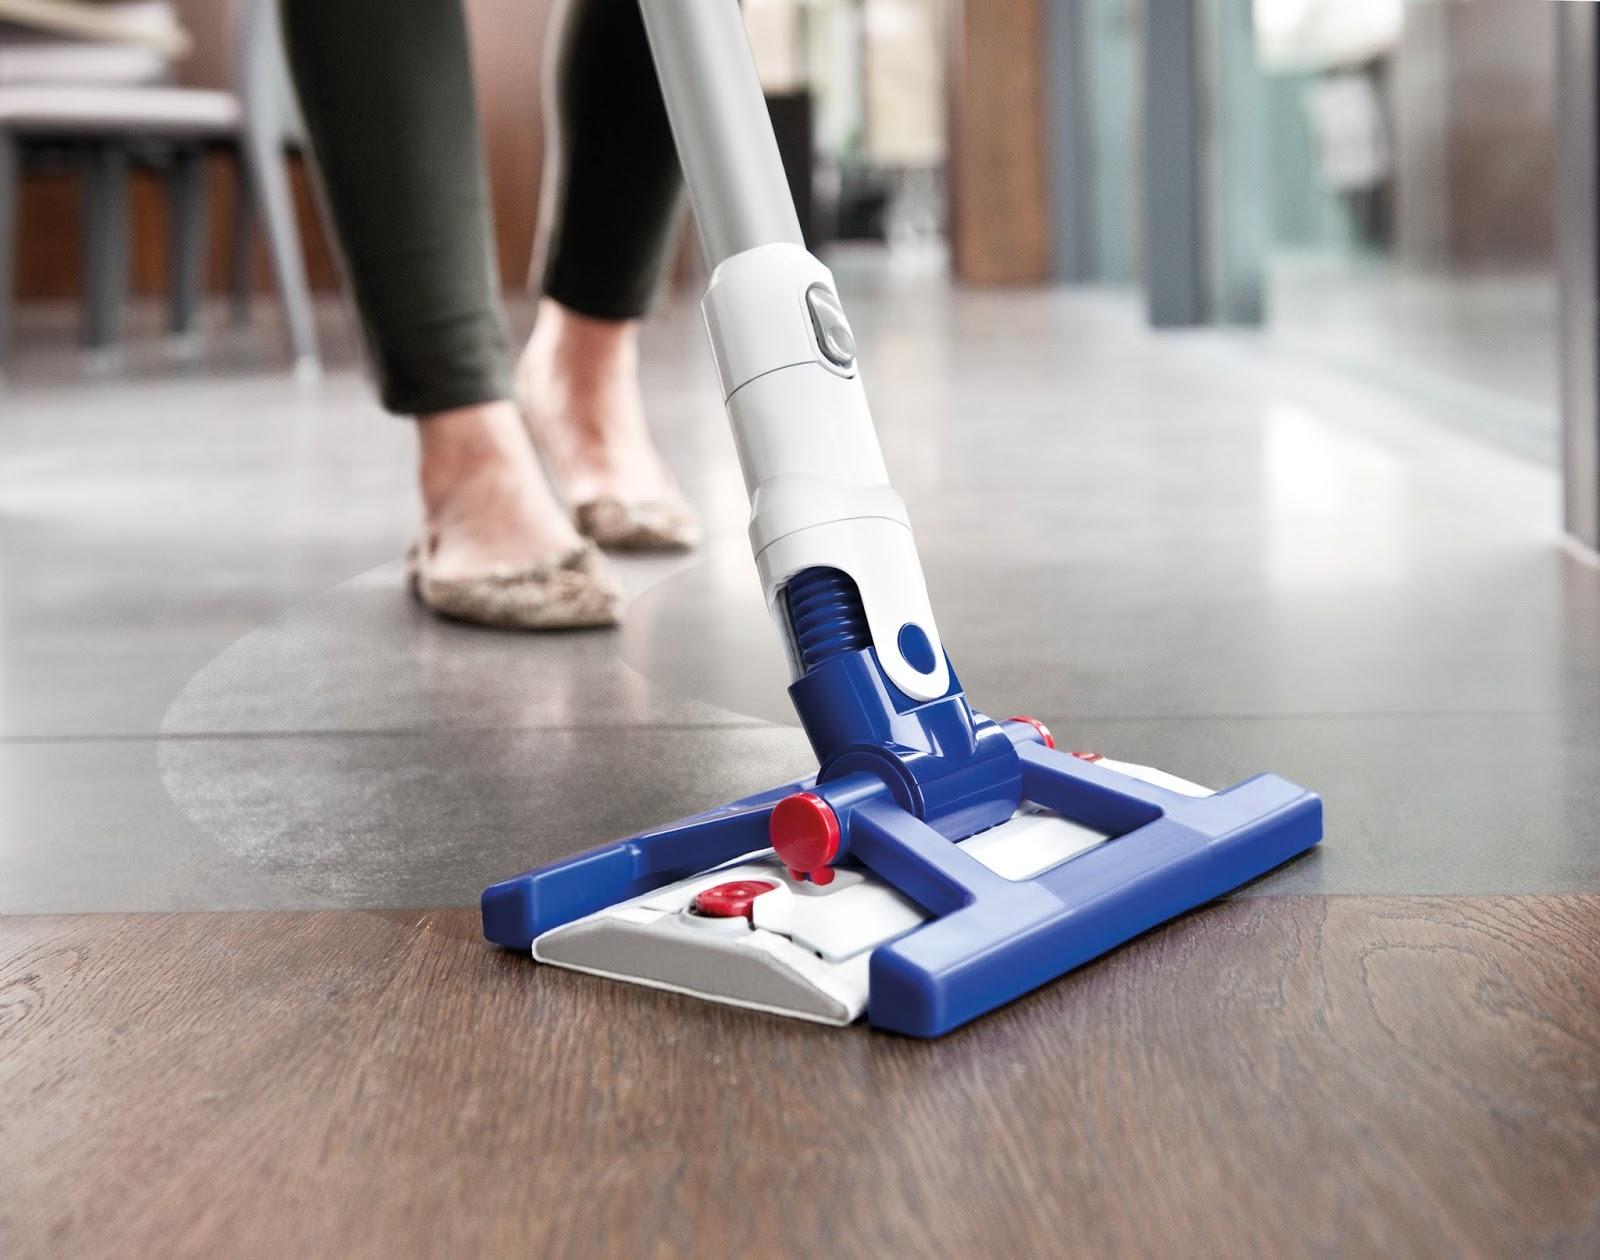 dyson floor cleaner